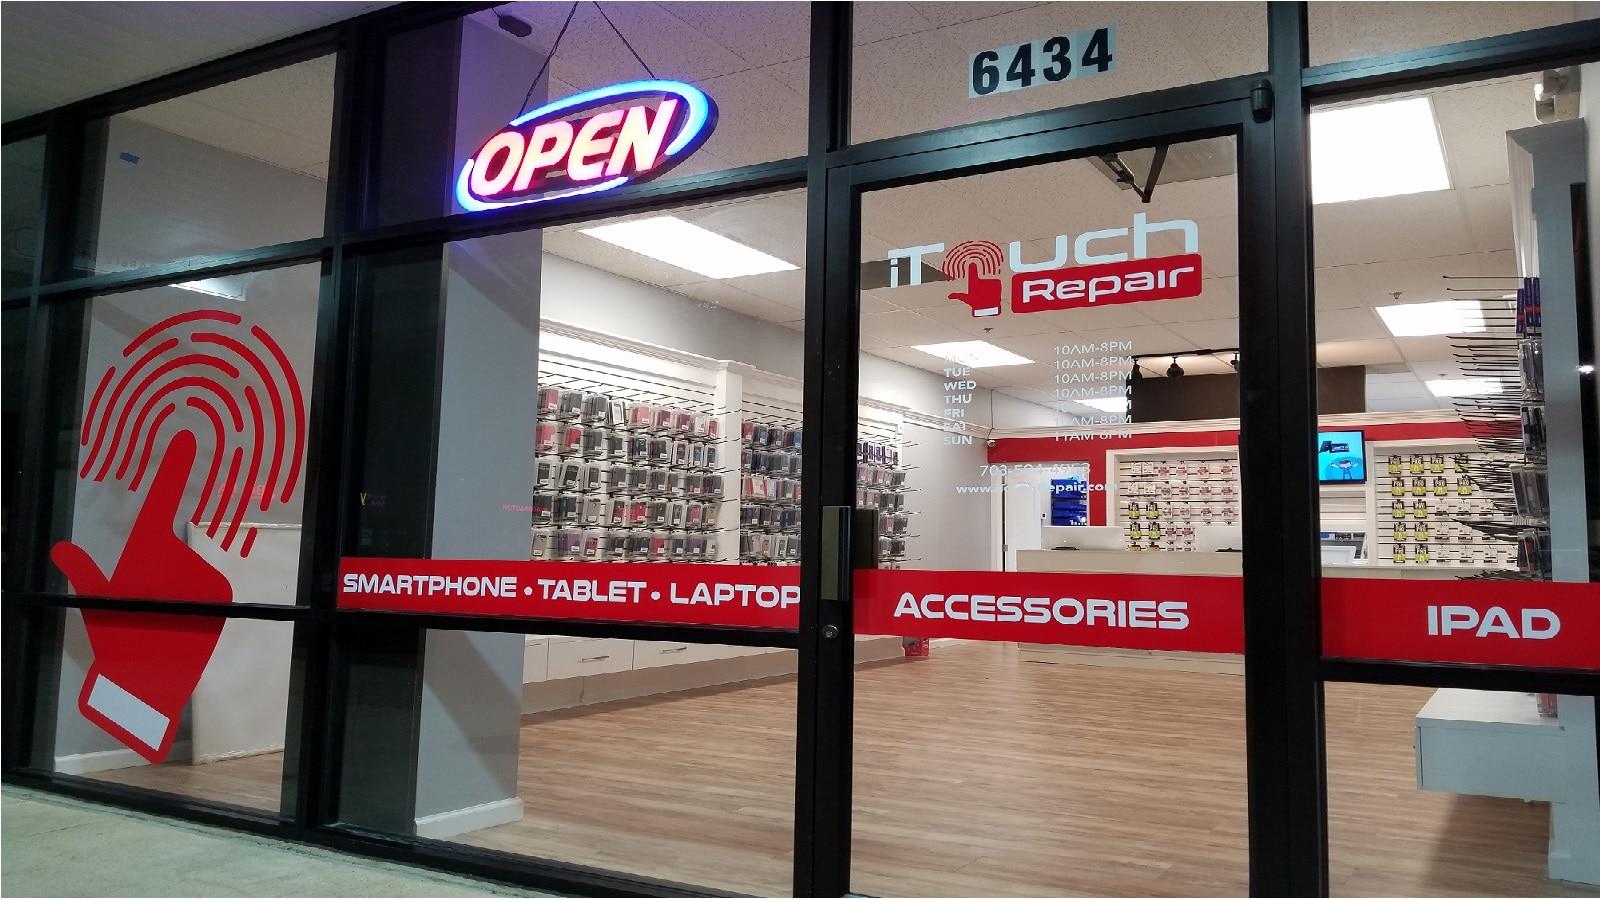 iPhone and Samsung Repair Shop in Alexandria, VA | iTouch Repair